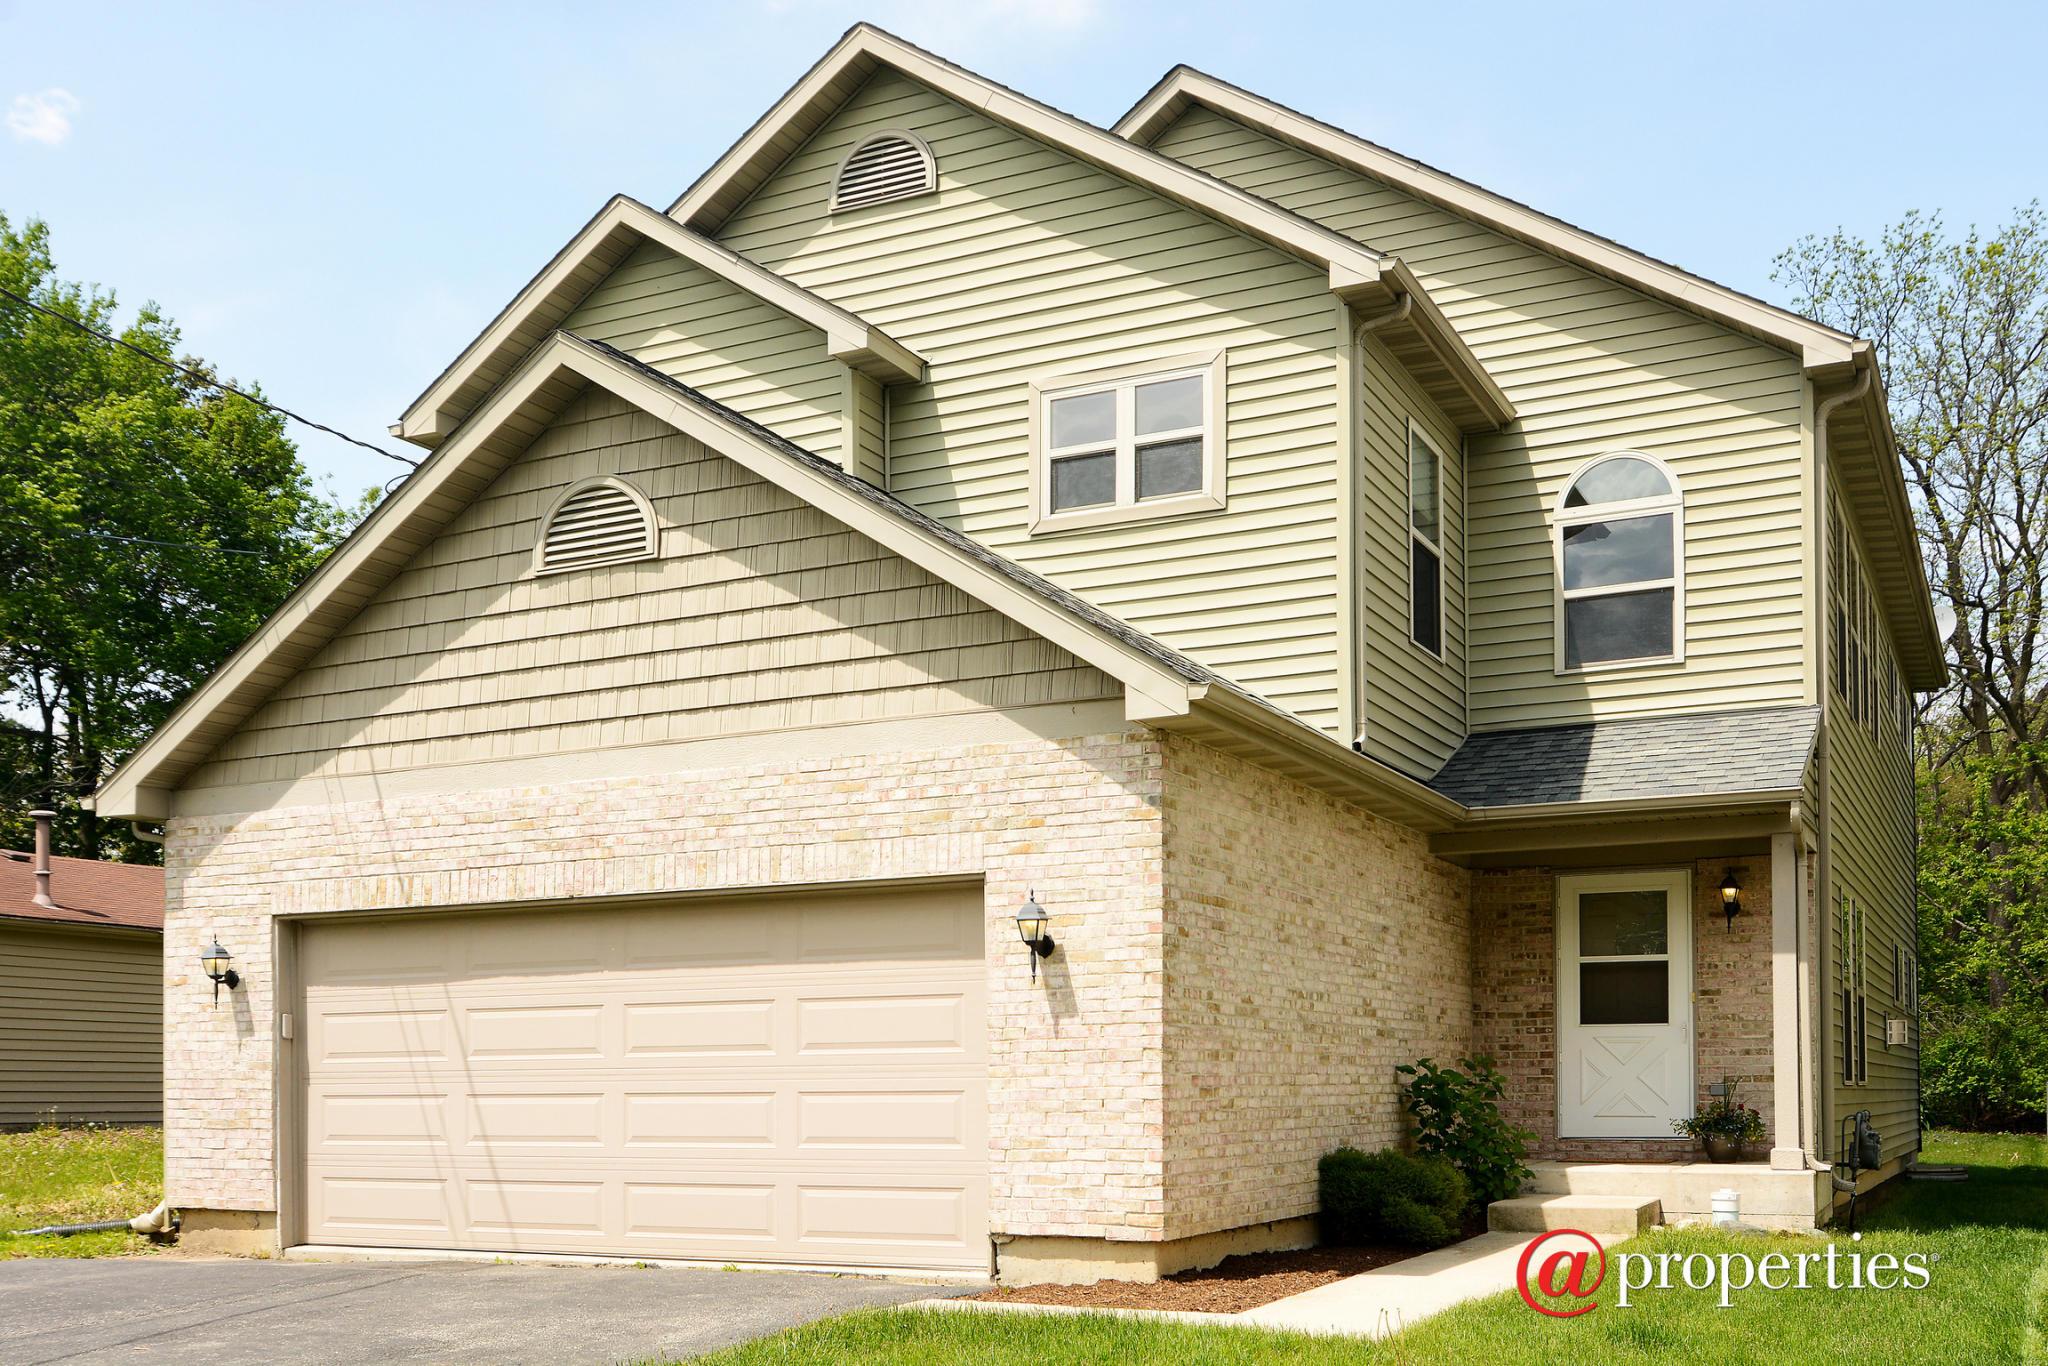 21344 W Ridge Rd, Lake Zurich, IL 60047 - Estimate and Home Details ...